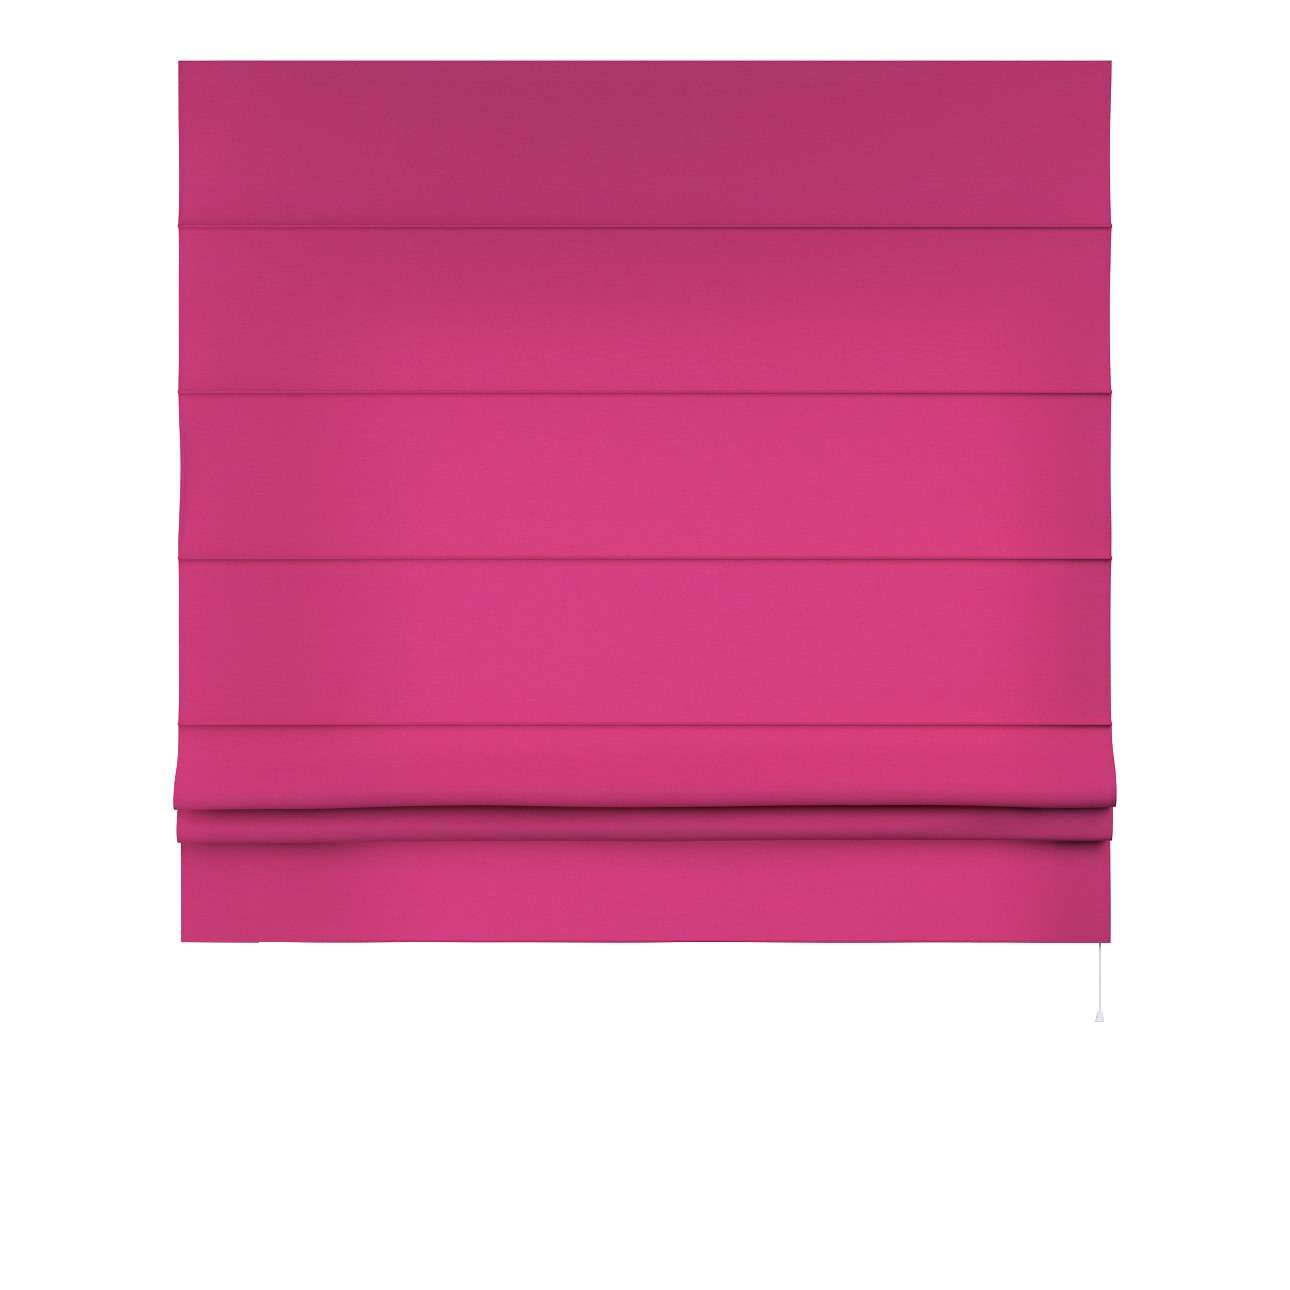 Padva roman blind  80 x 170 cm (31.5 x 67 inch) in collection Loneta , fabric: 133-60